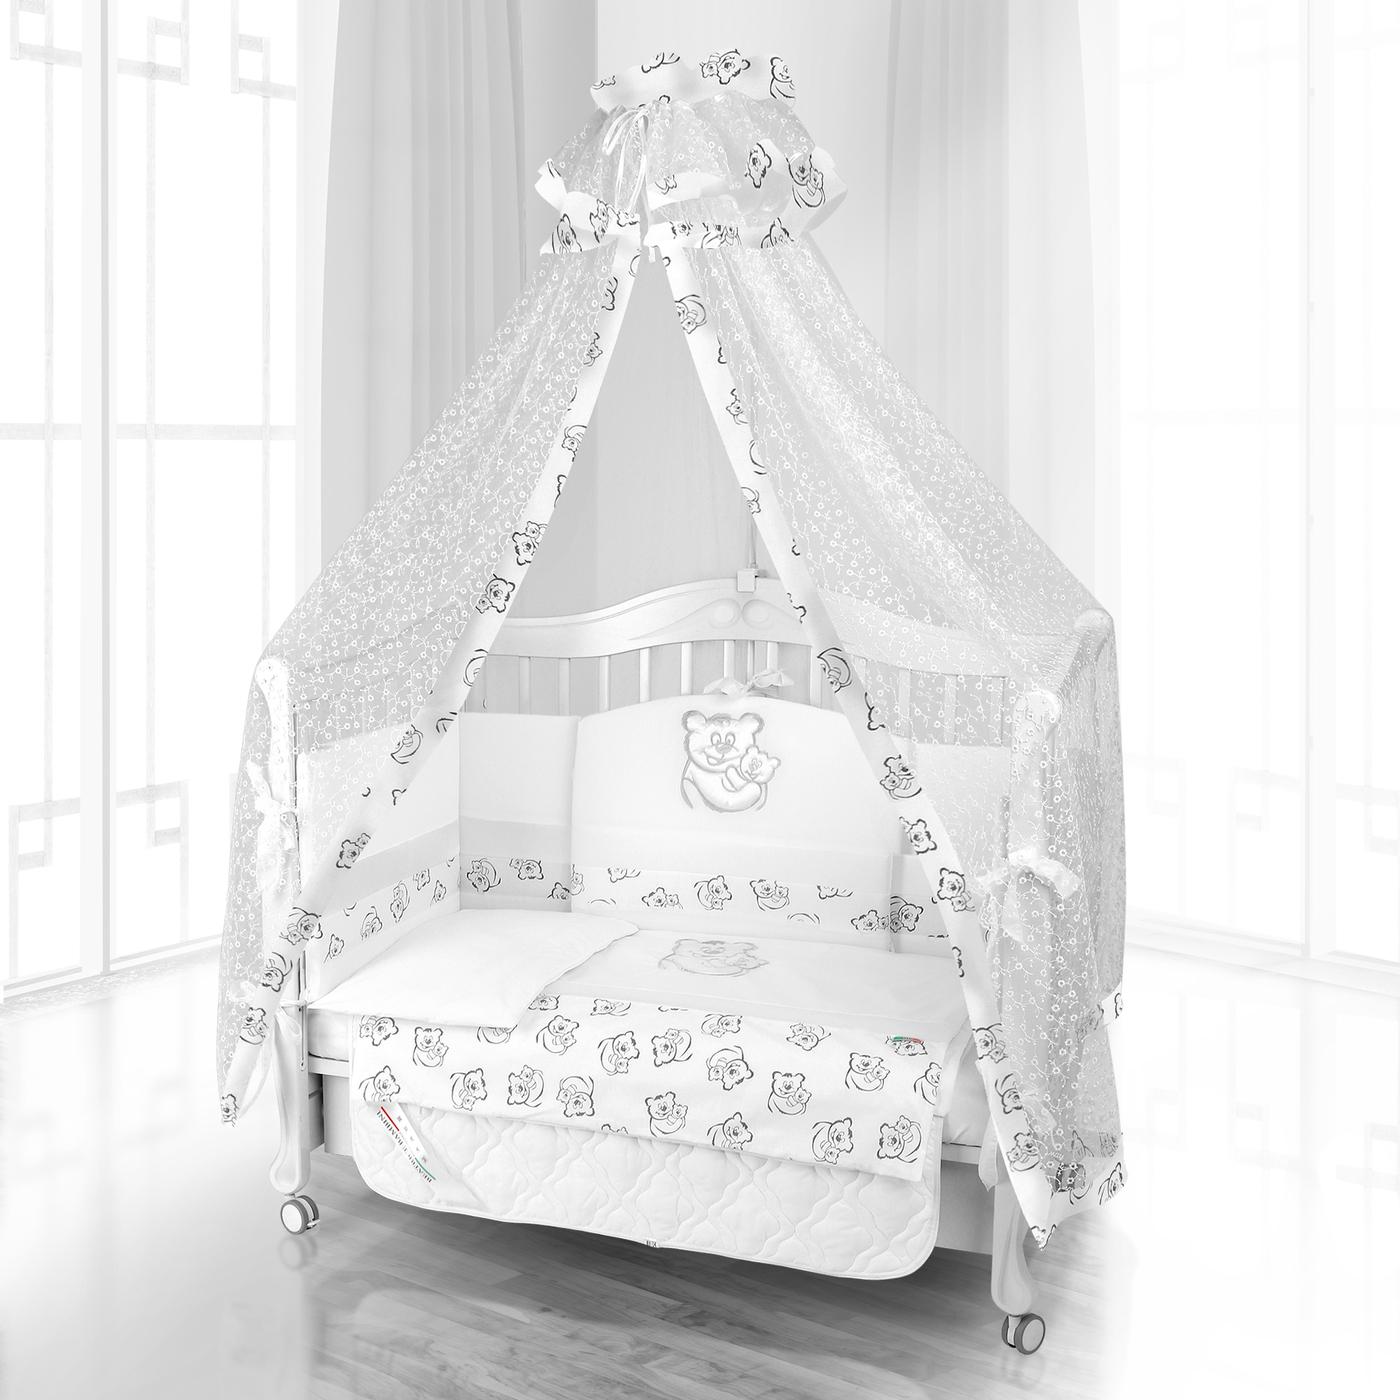 Комплект постельного белья Beatrice Bambini Unico Orso Mamma (125х65) - bianco& bianco